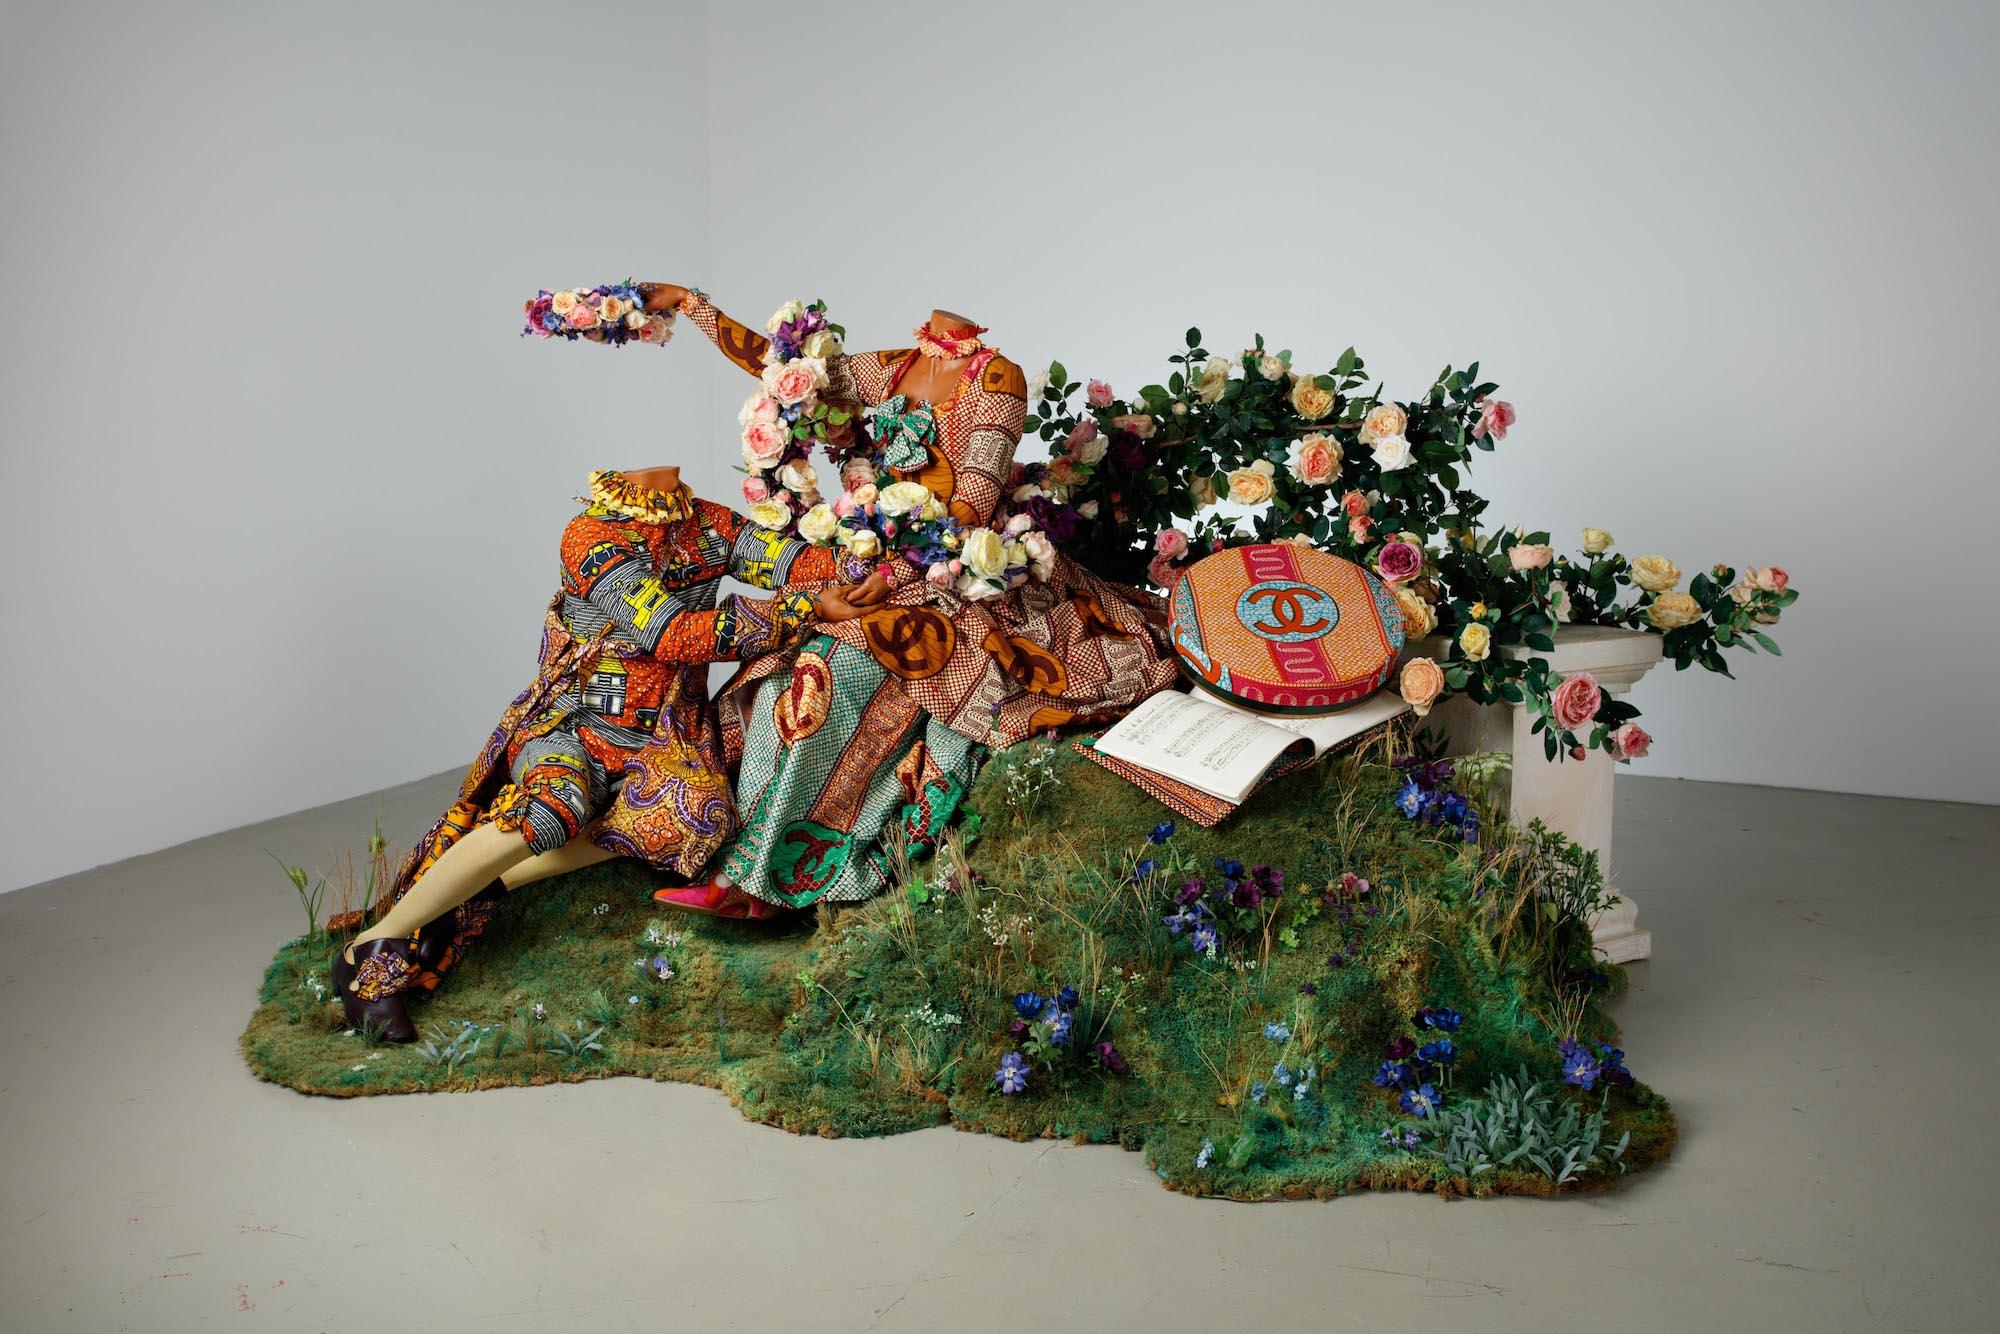 Yinka Shonibare, The Crowing, 2007